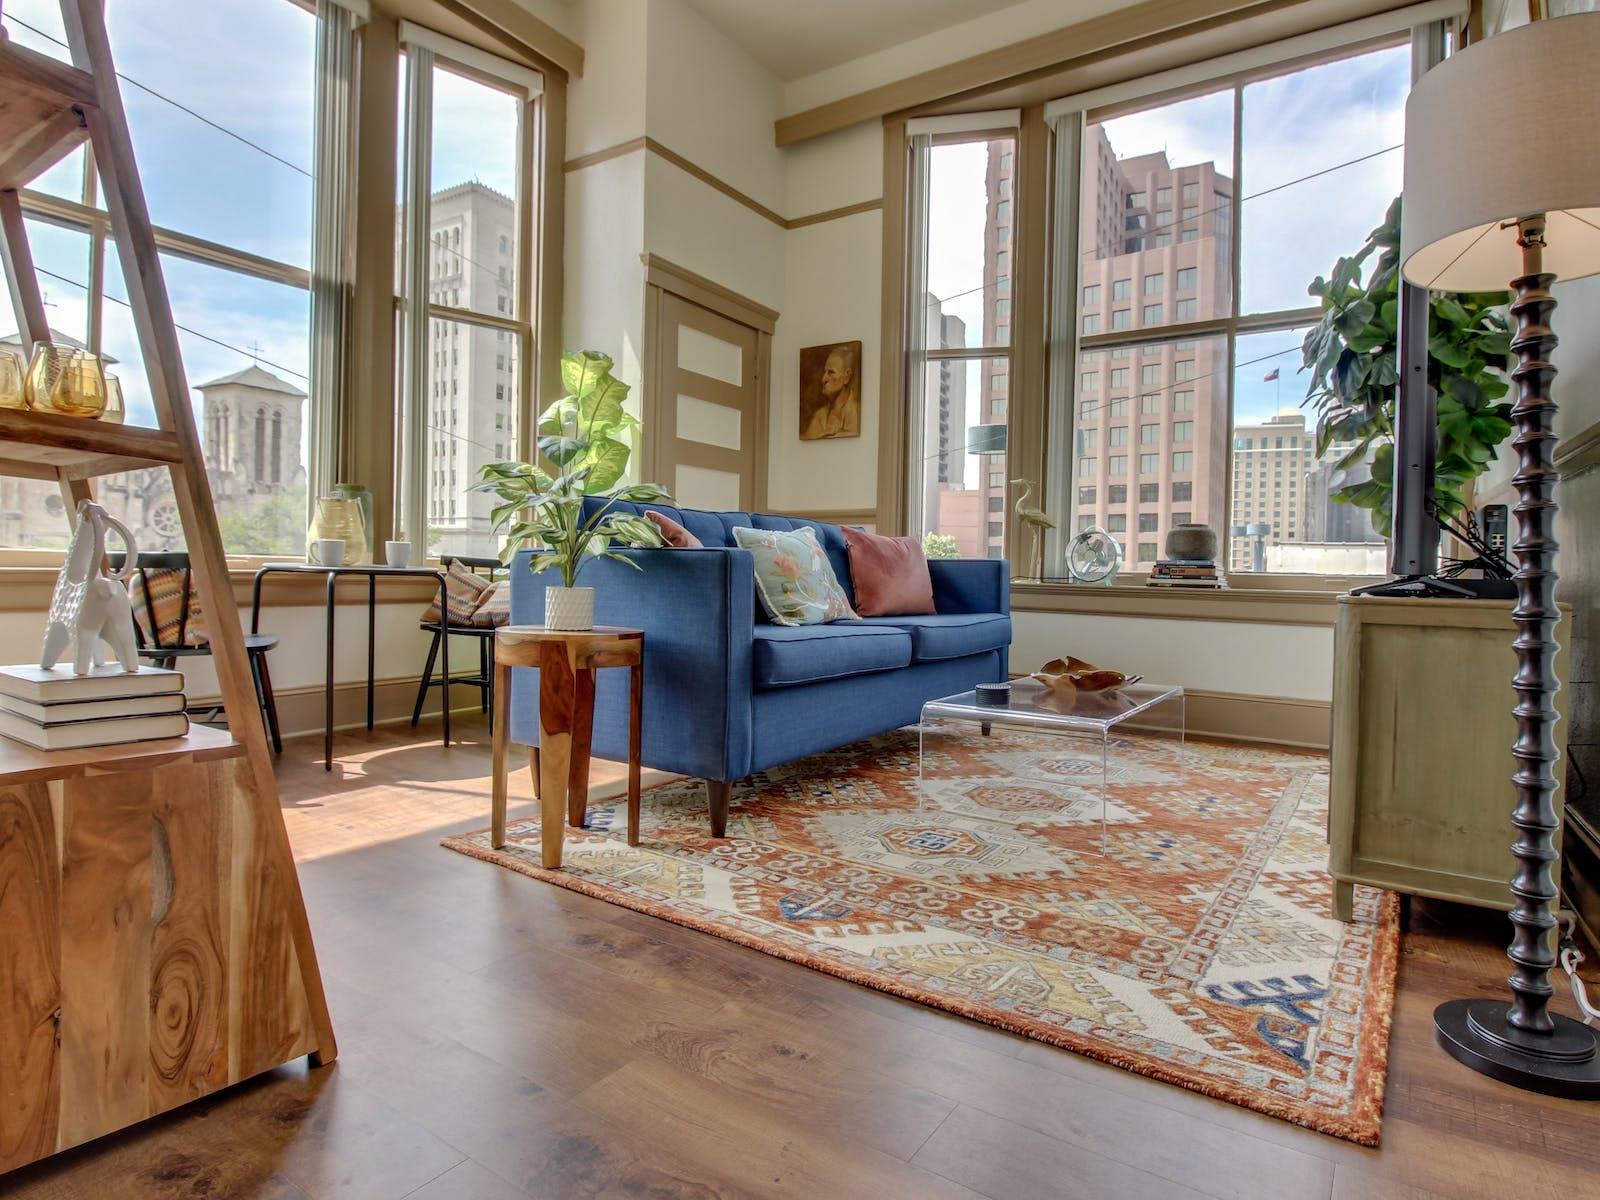 Living room of San Antonio, TX vacation rental